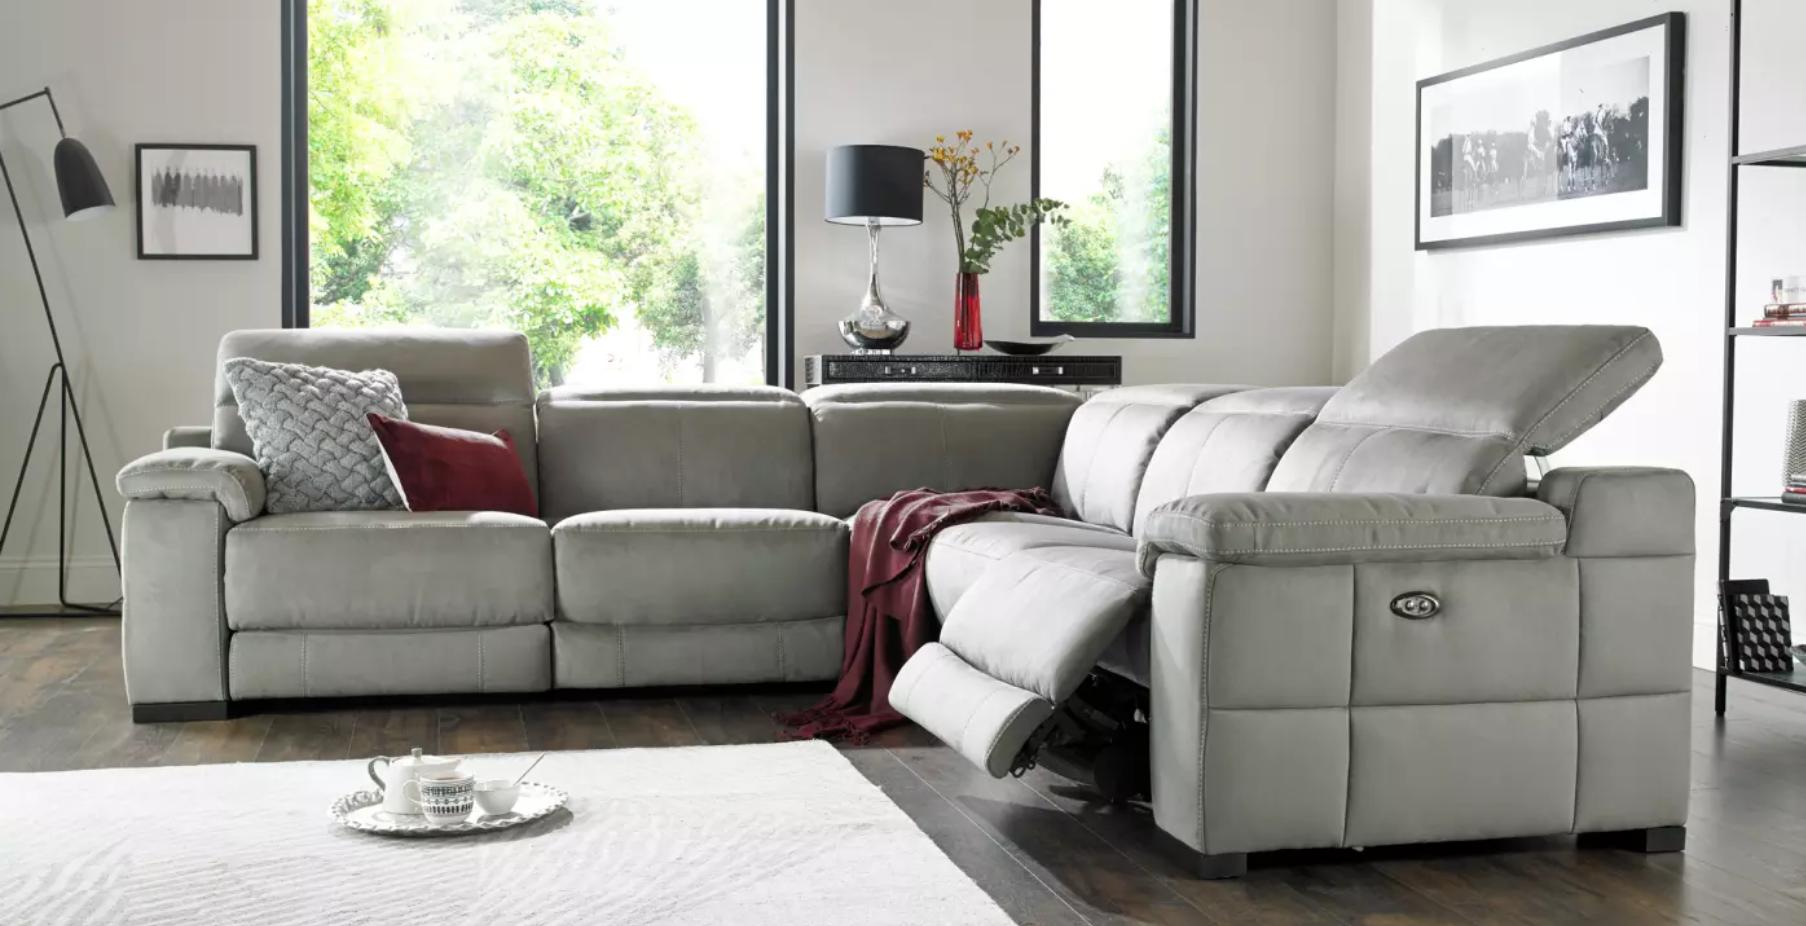 Pin By Invicta On Living Room Ideas Fabric Sofa Sofa Sofa Bed